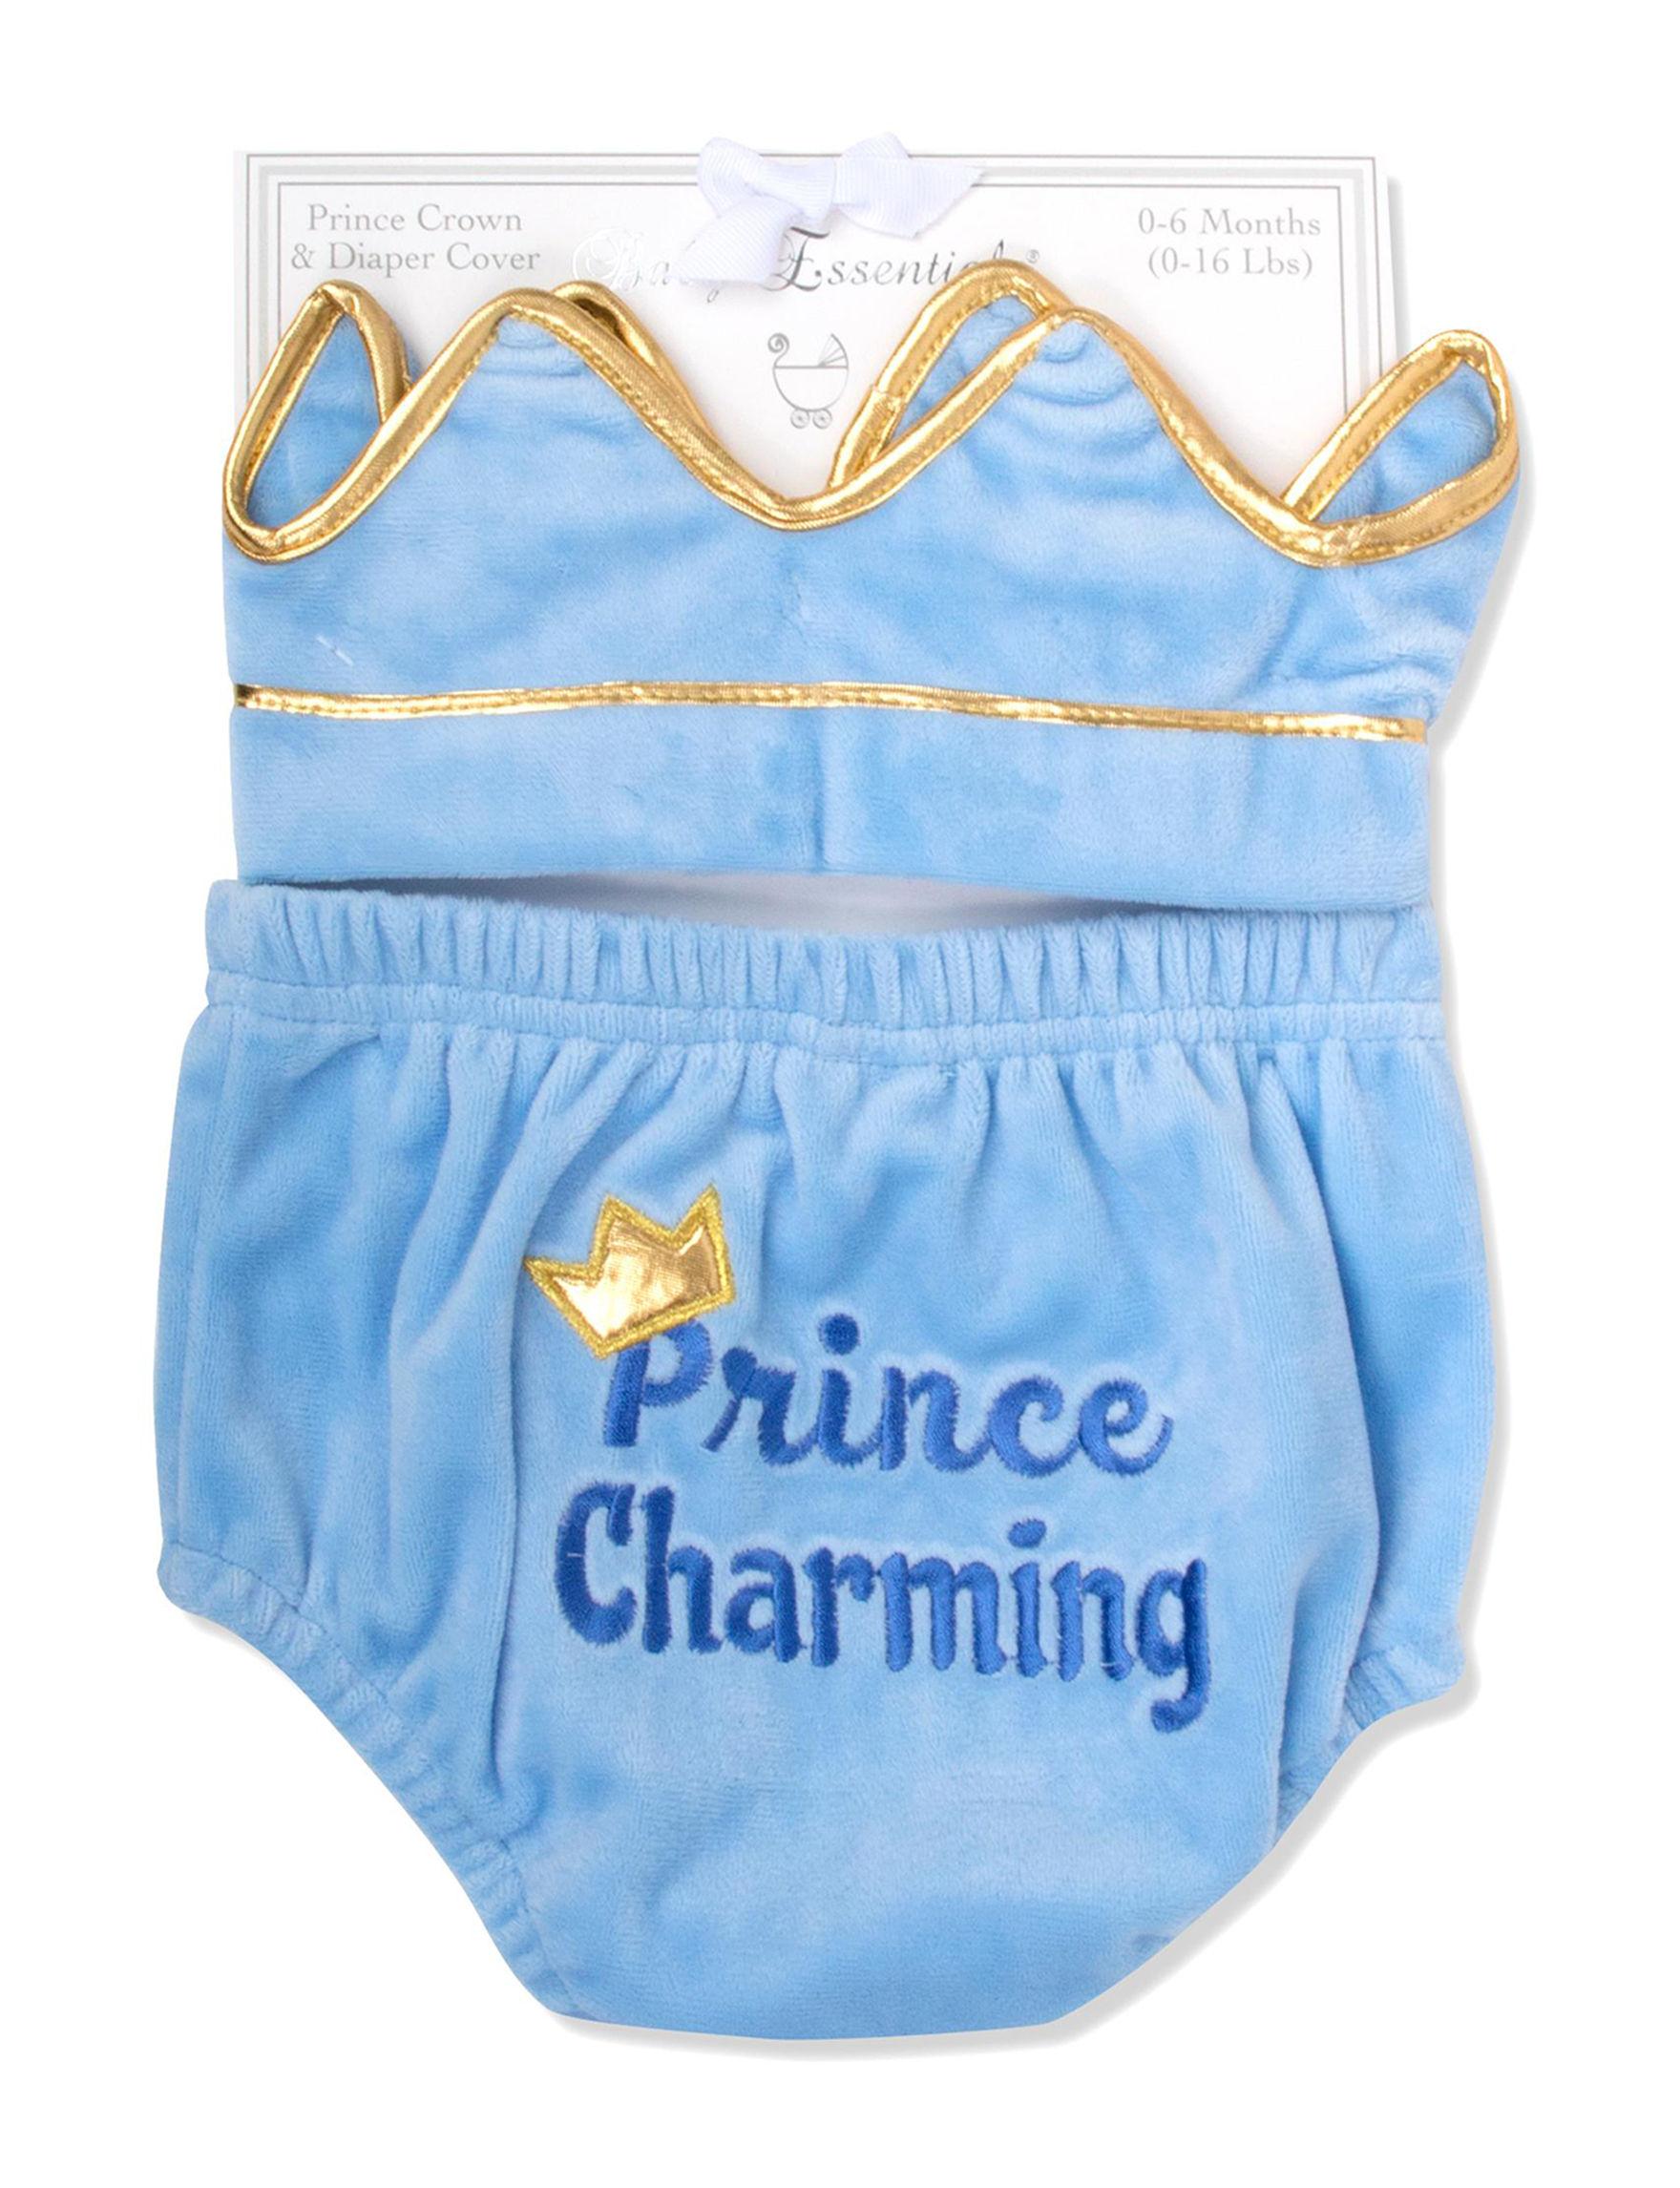 Baby Essentials Blue Diaper Bags